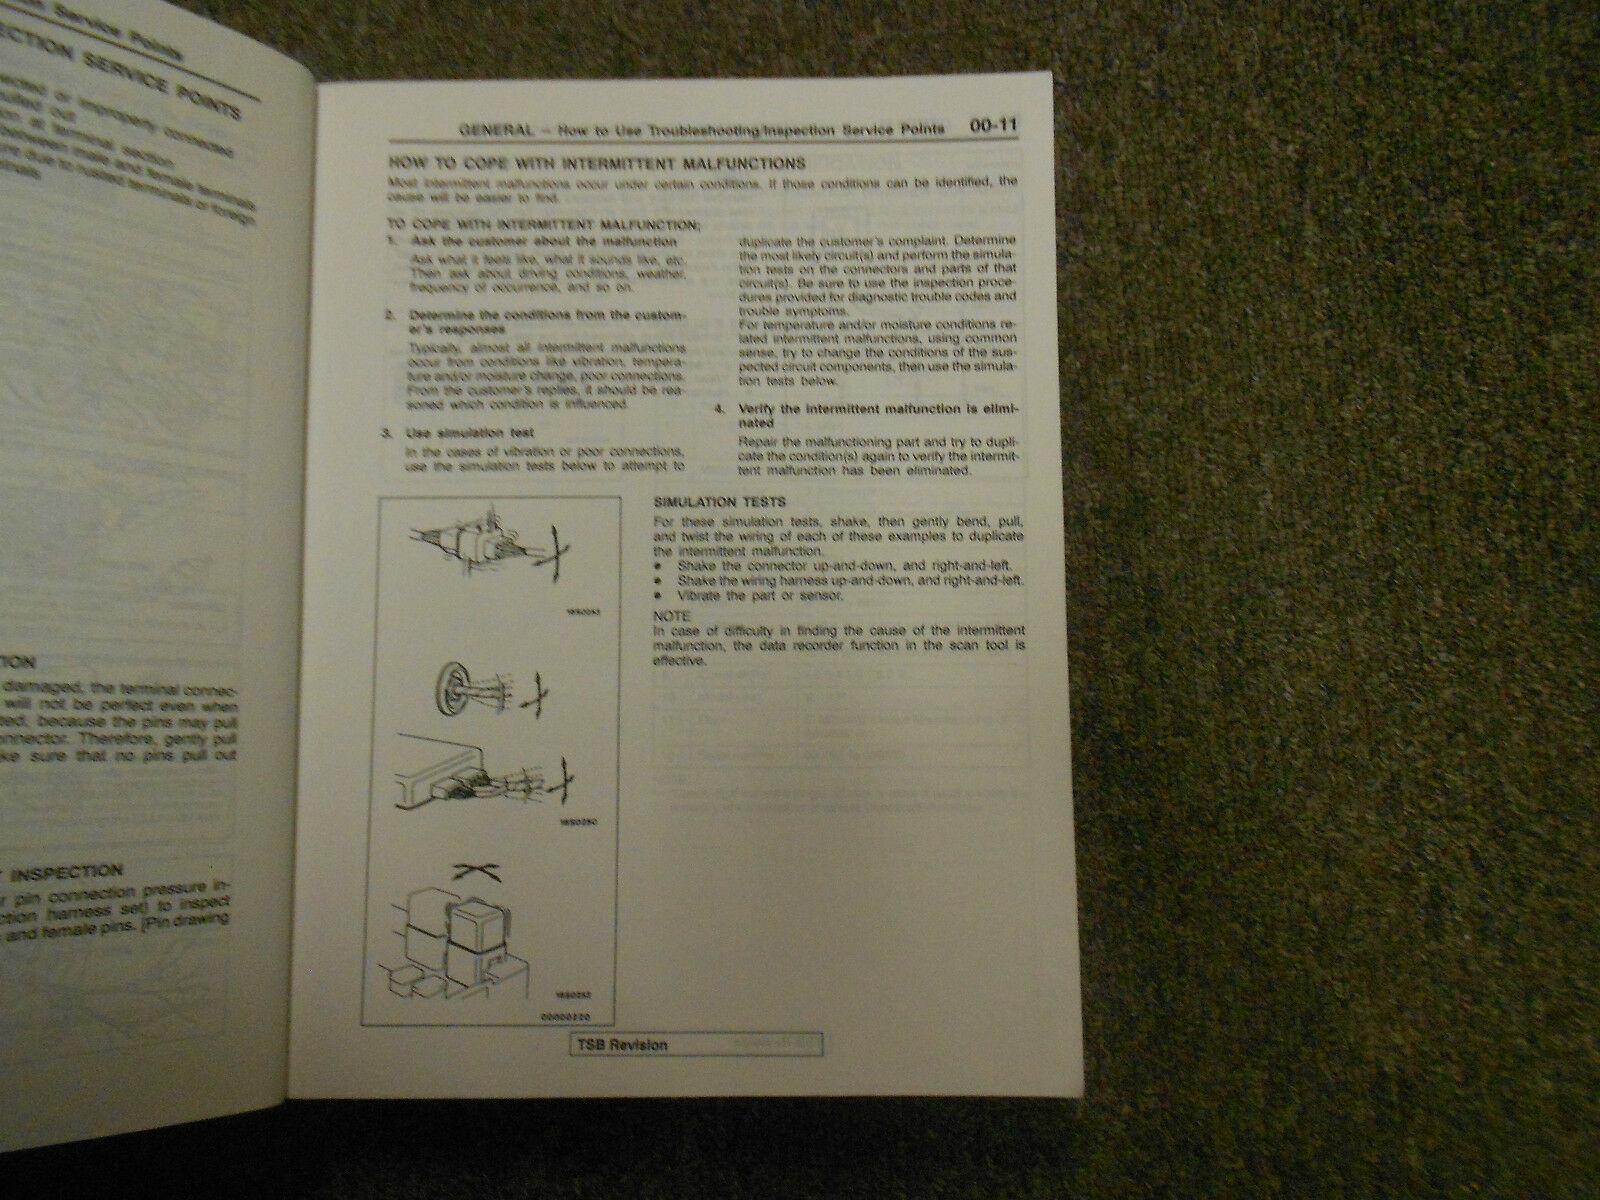 1997 MITSUBISHI Galant Service Repair Shop Manual VOL 1 FACTORY OEM BOOK 97 DEAL